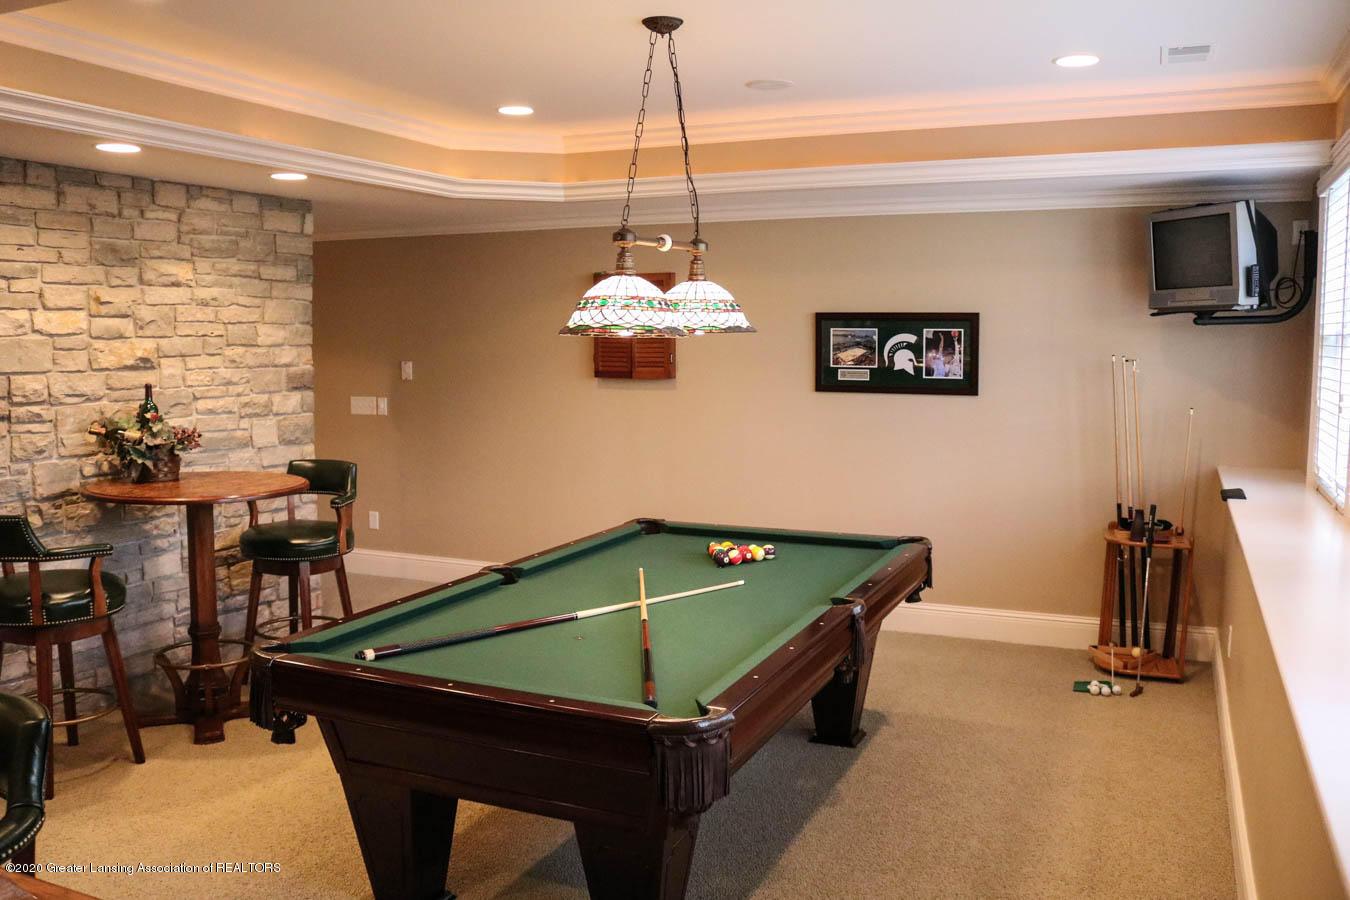 6090 Standish Ct - Pool Table room - 82